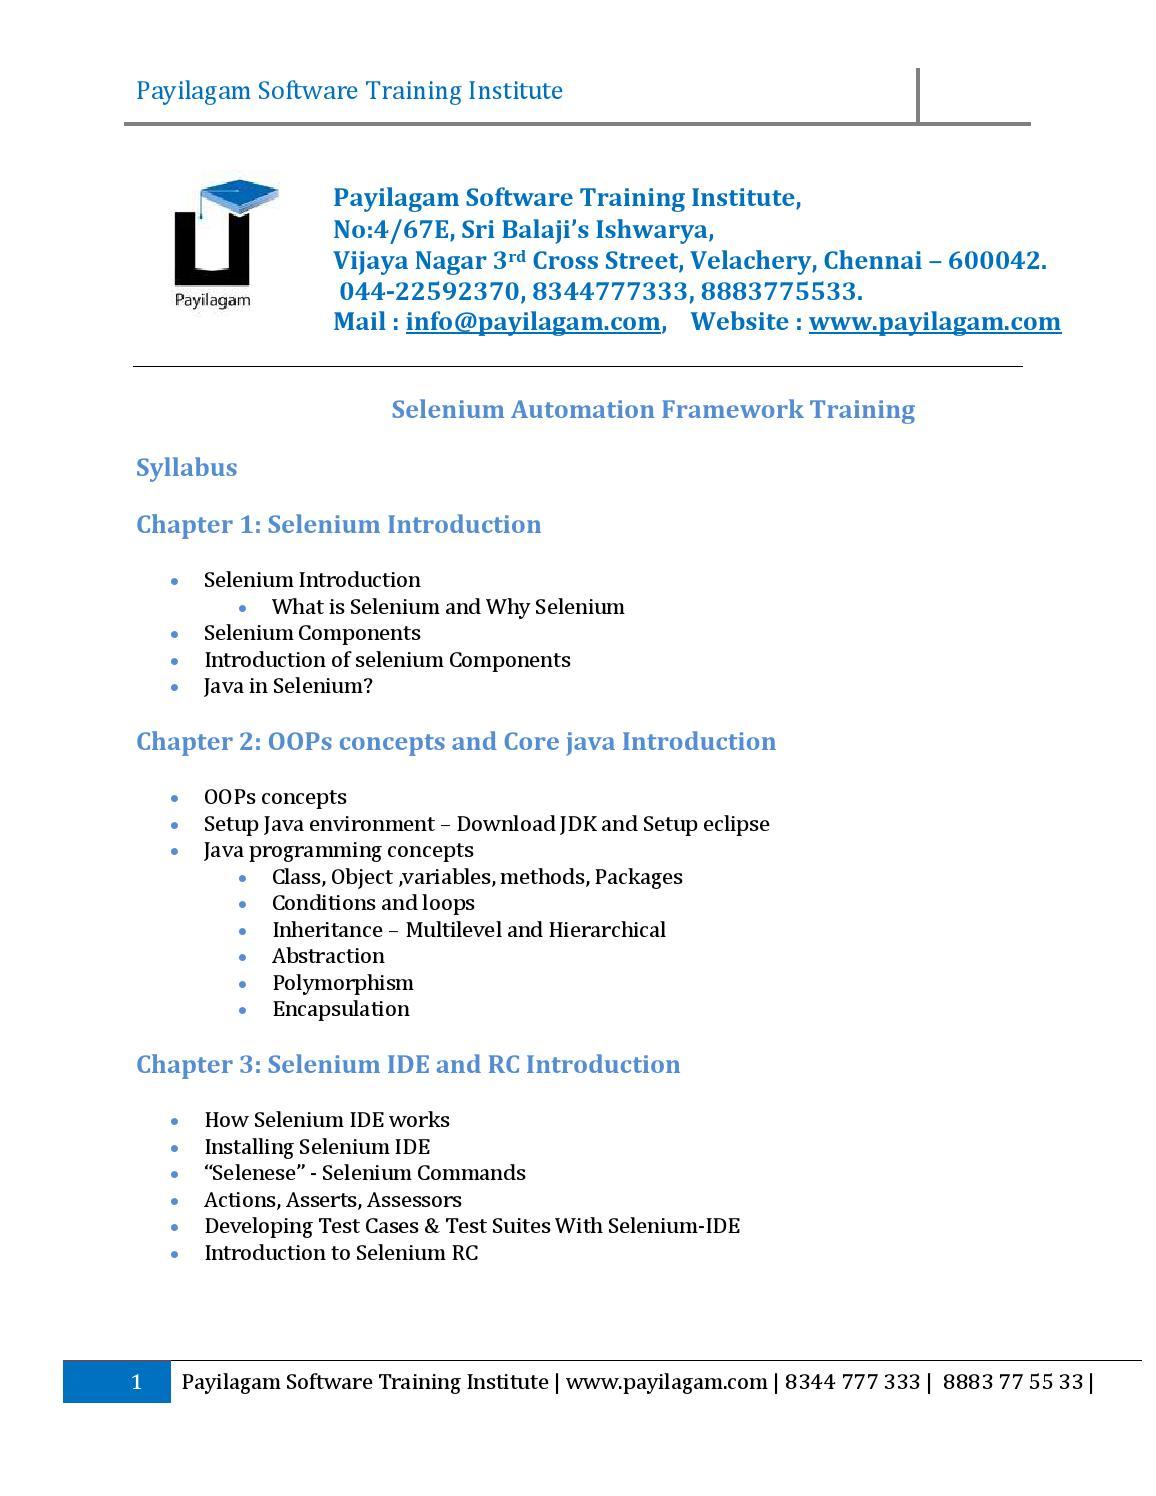 Payilagam selenium testing training syllabus by payilagam - issuu